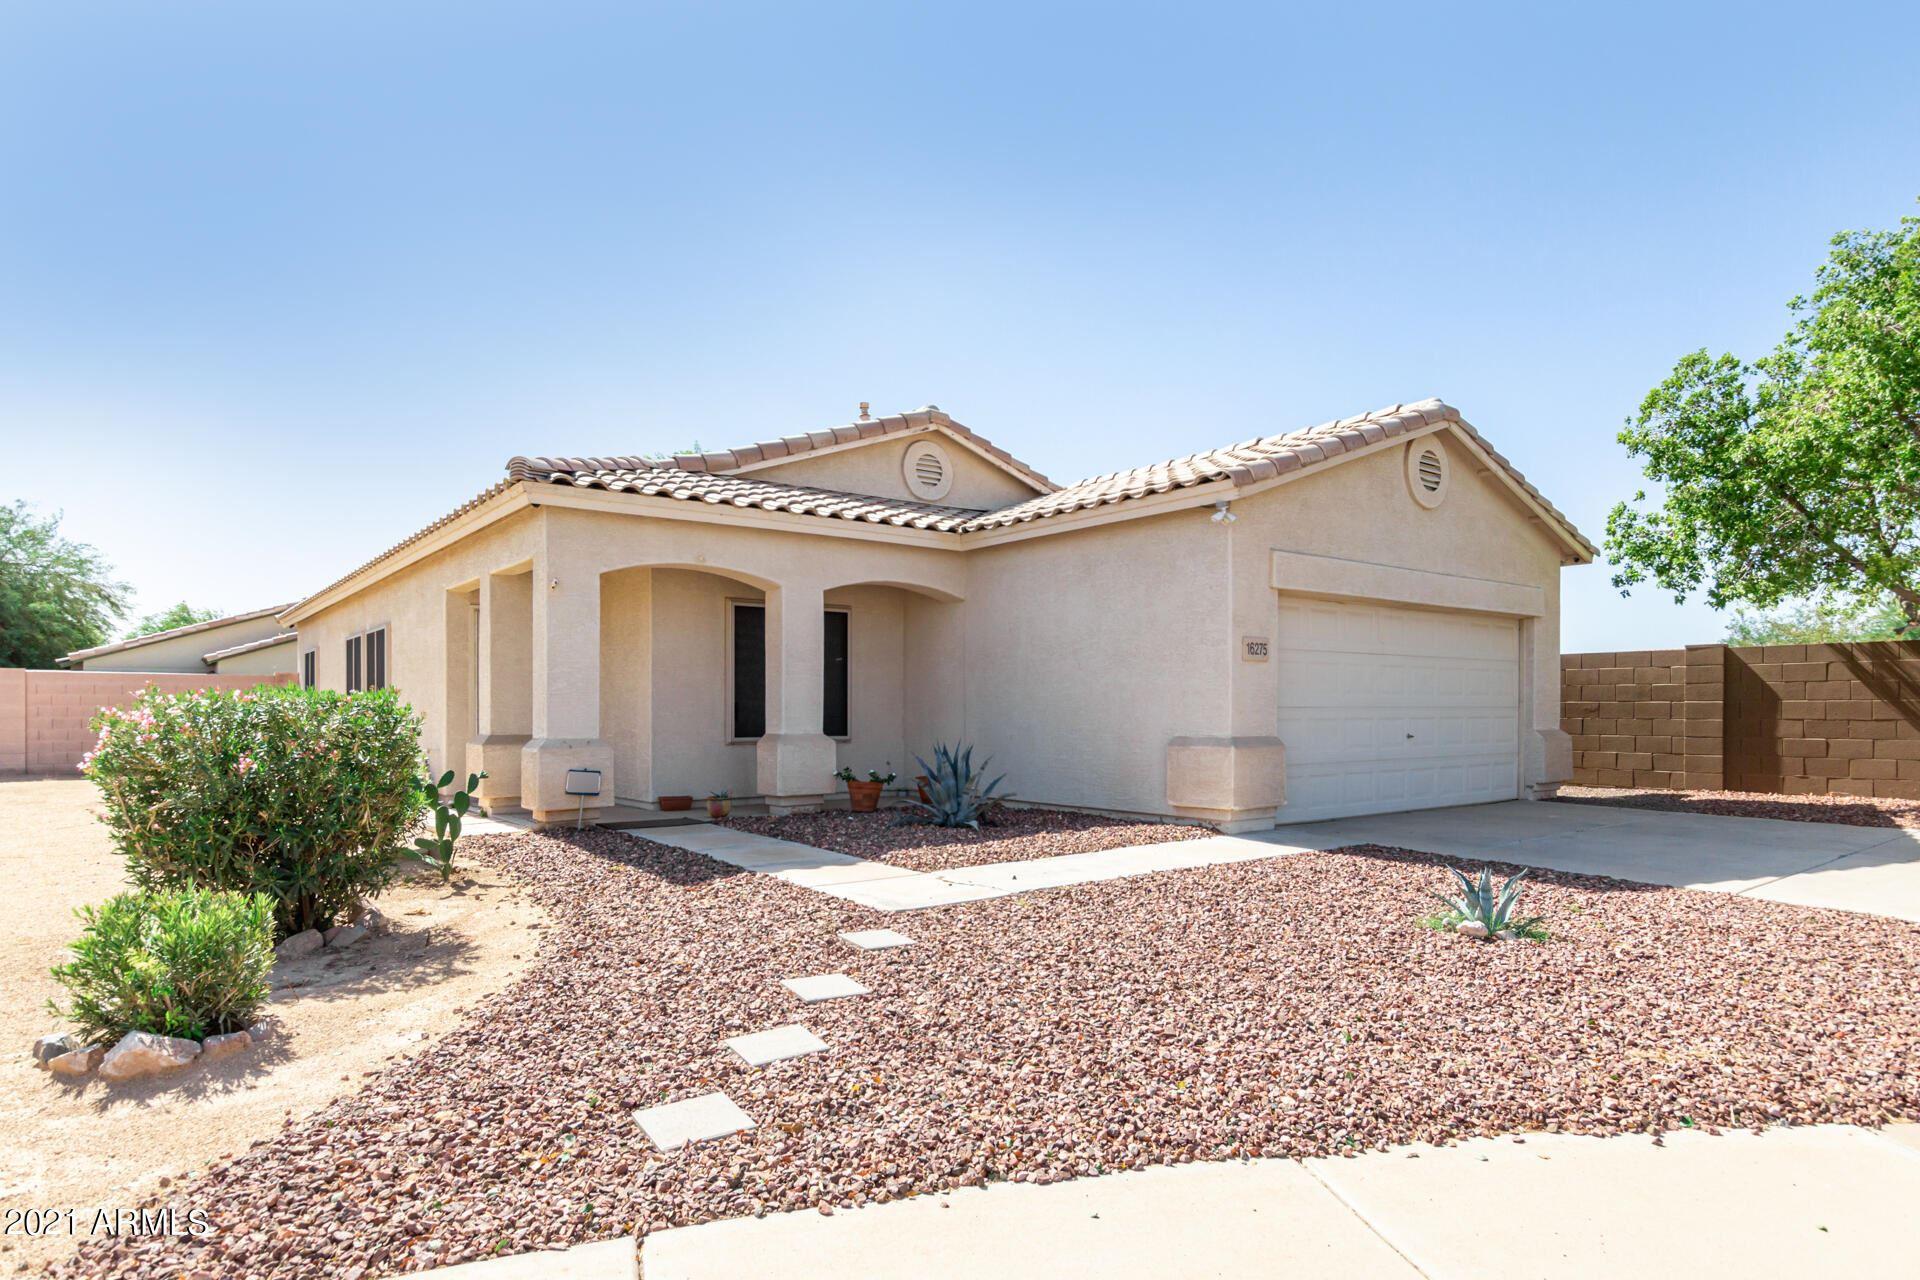 Photo of 16275 W LILAC Street, Goodyear, AZ 85338 (MLS # 6306905)